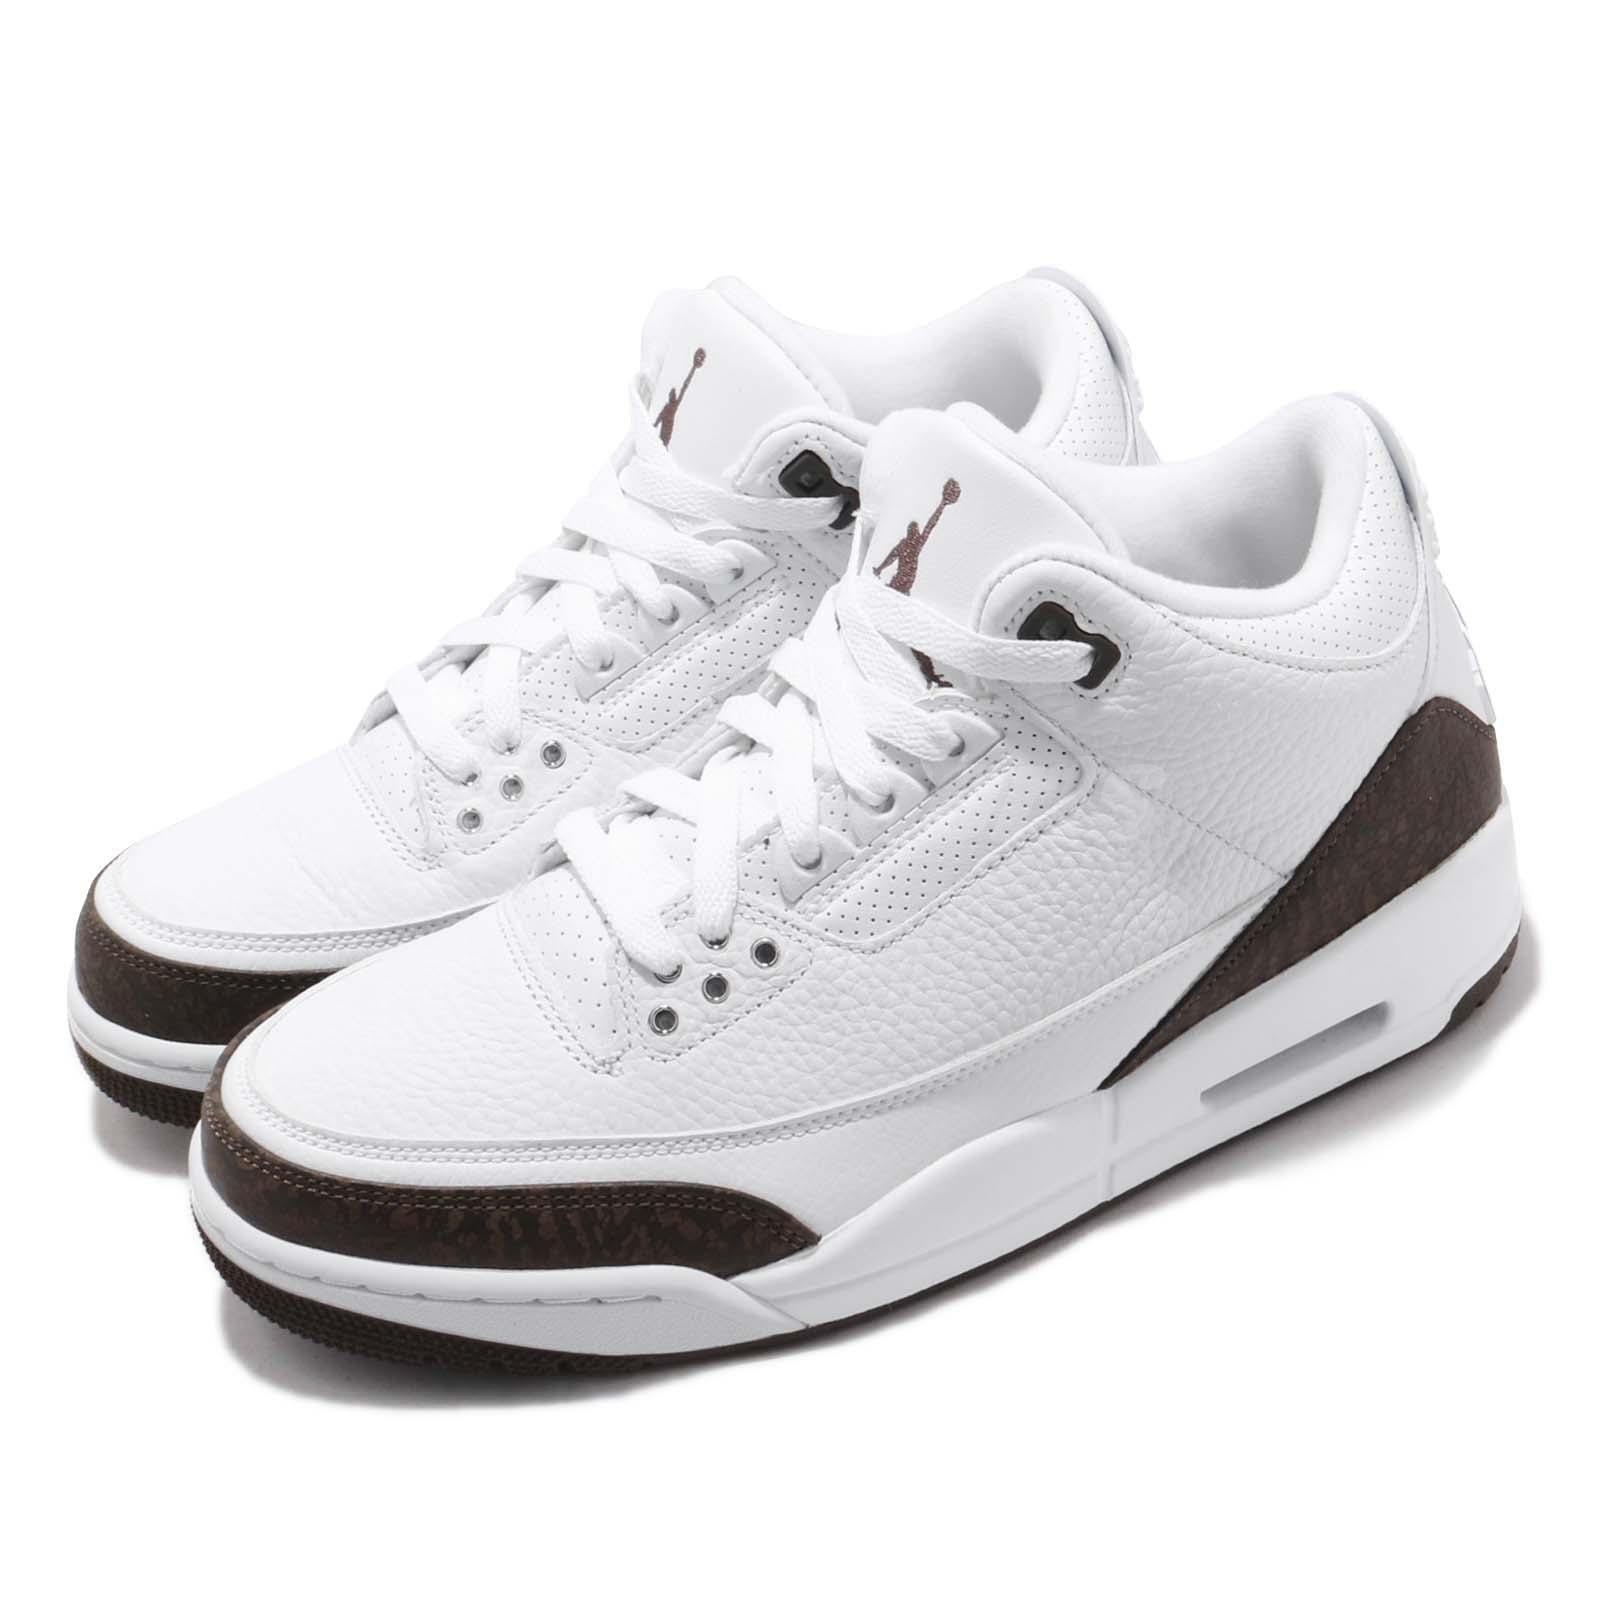 los angeles 92270 9955f Details about Nike Air Jordan 3 Retro Mocha 2018 III AJ3 White Men  Basketball Shoes 136064-122